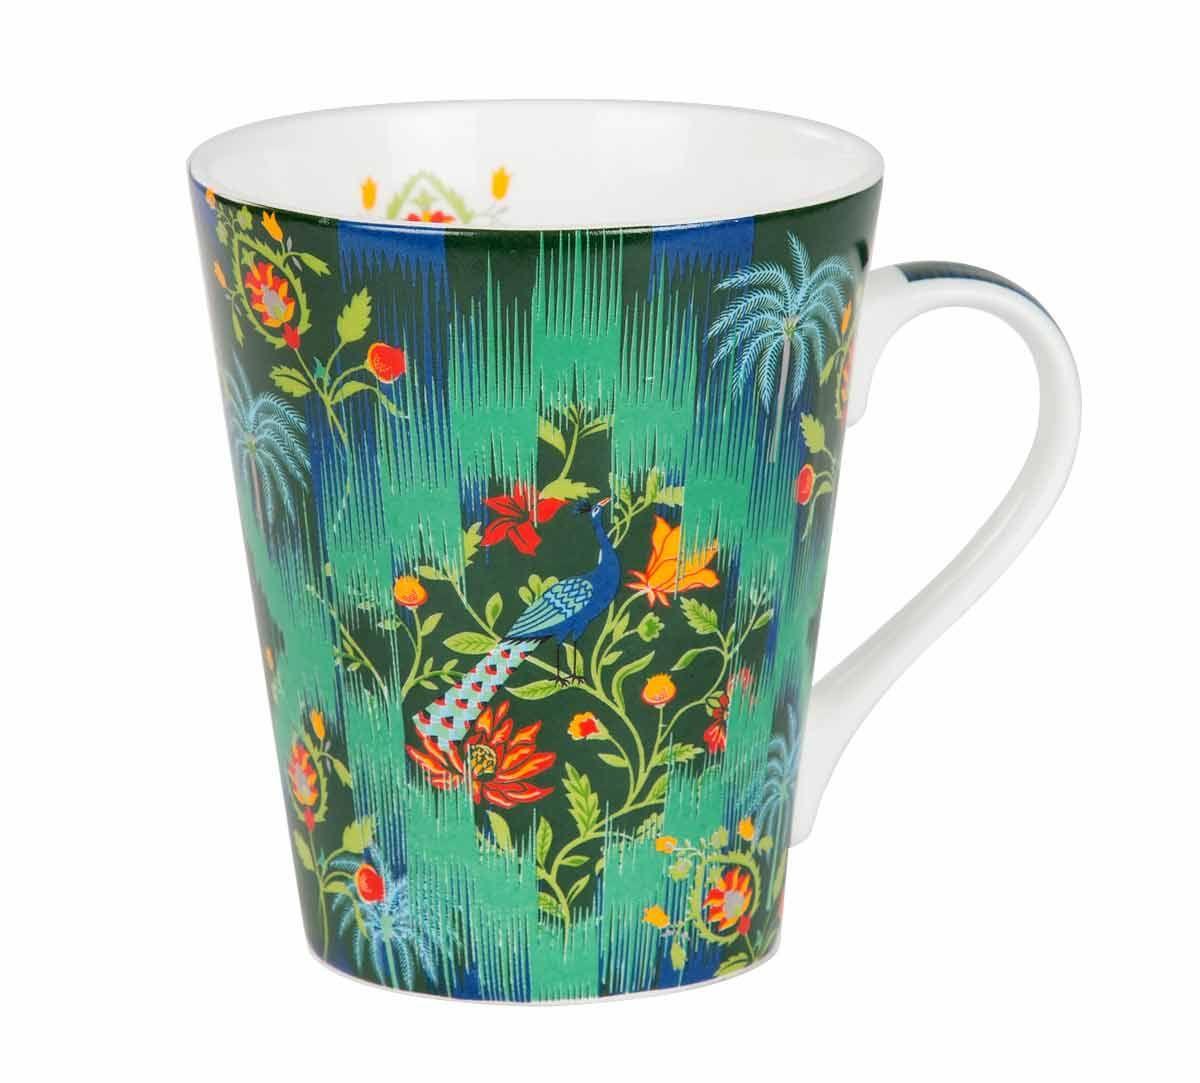 Reign of the Peafowl Bone China Mug